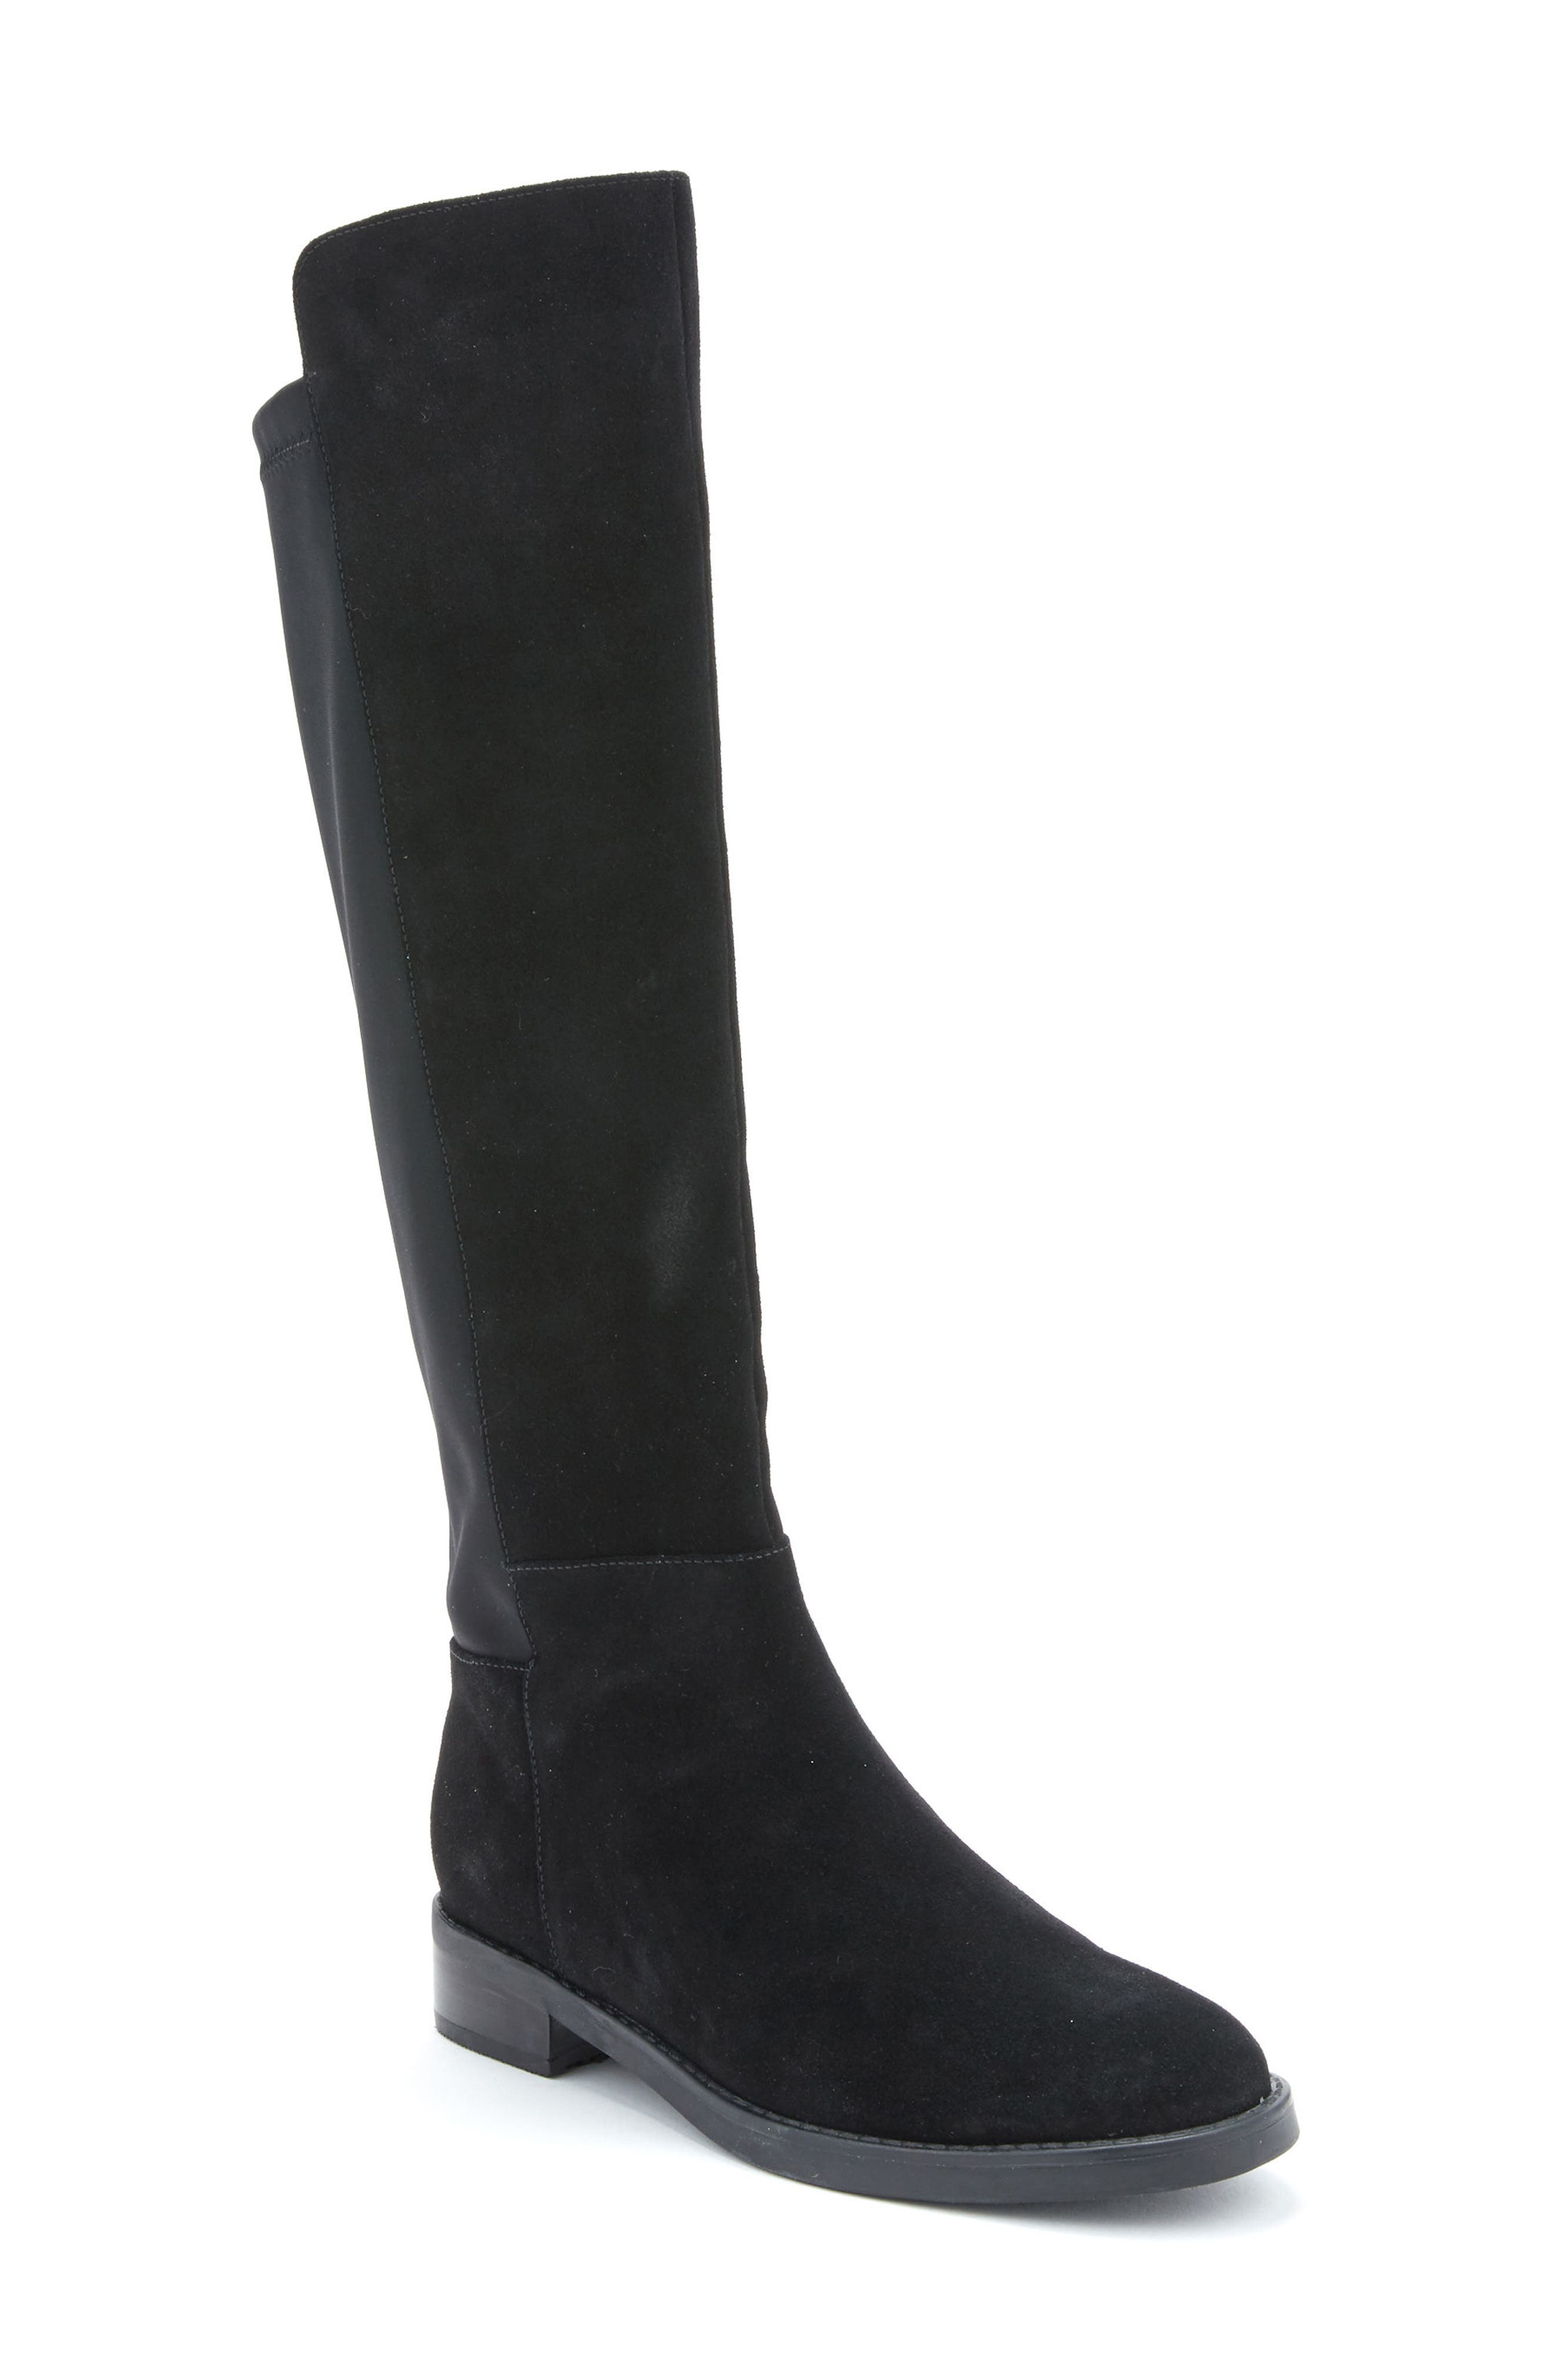 Ellie Waterproof Knee High Riding Boot,                             Main thumbnail 1, color,                             BLACK SUEDE